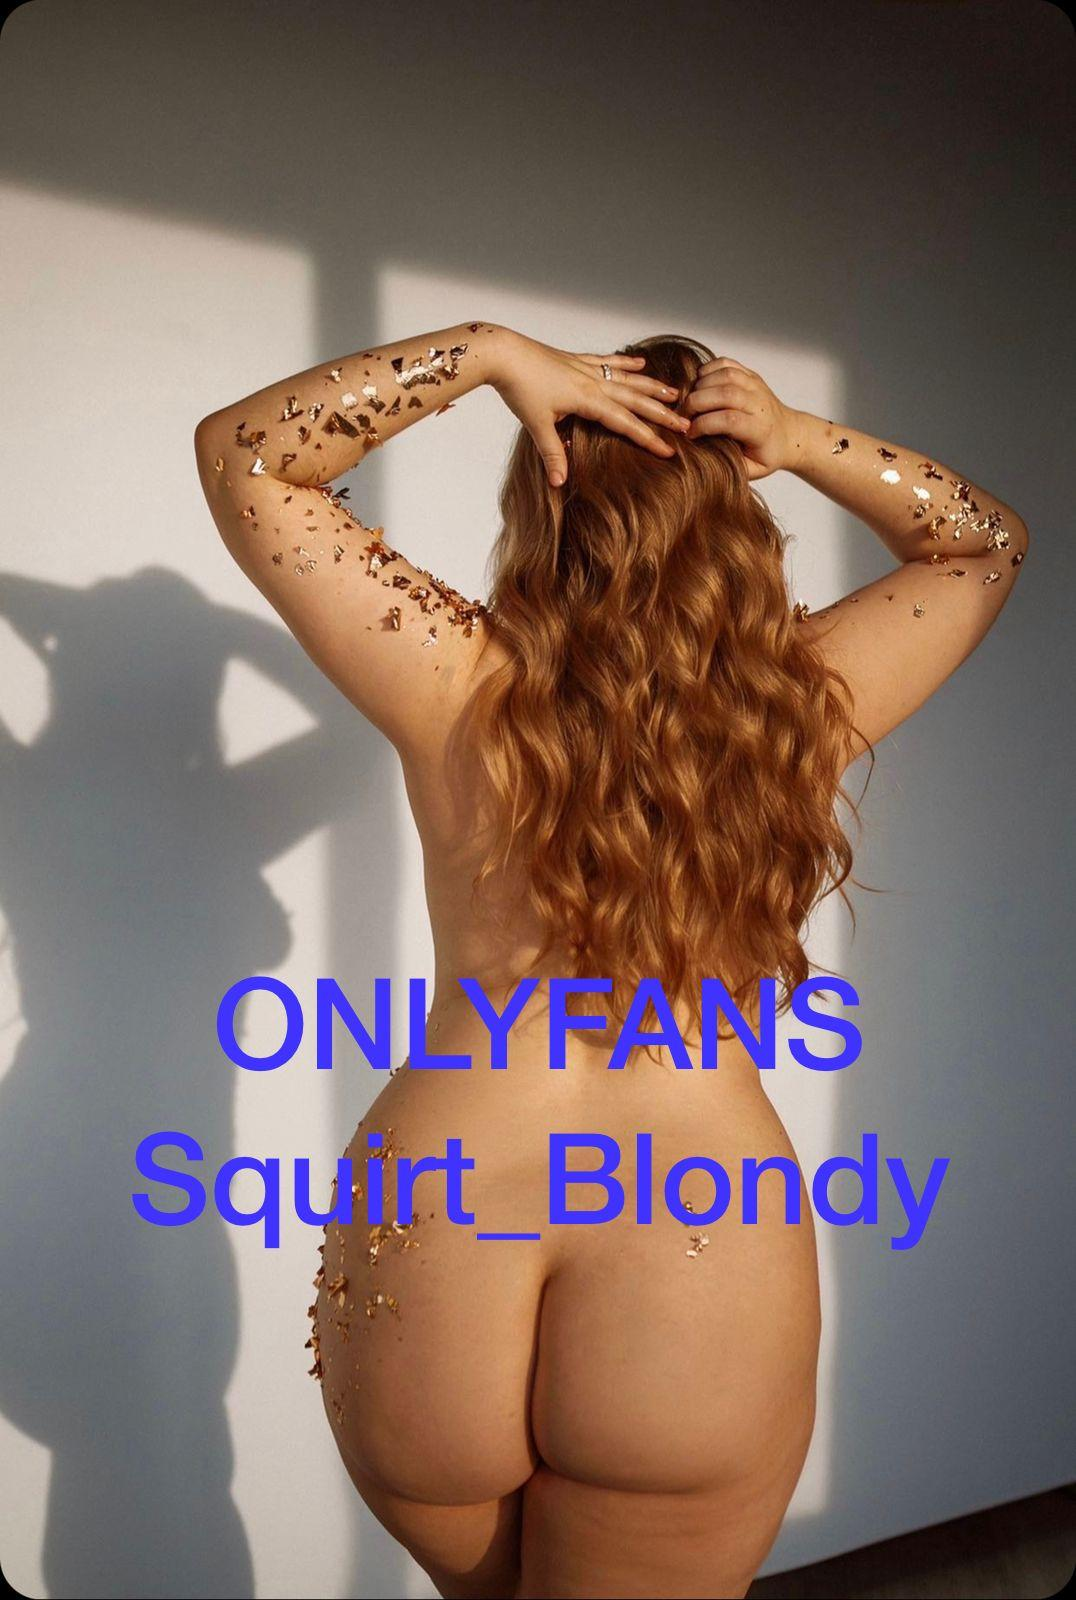 Squirt blondy?s=zdyumb8mhpeoathg0lrfmoq25fiv3fgpeqycefvyn78=